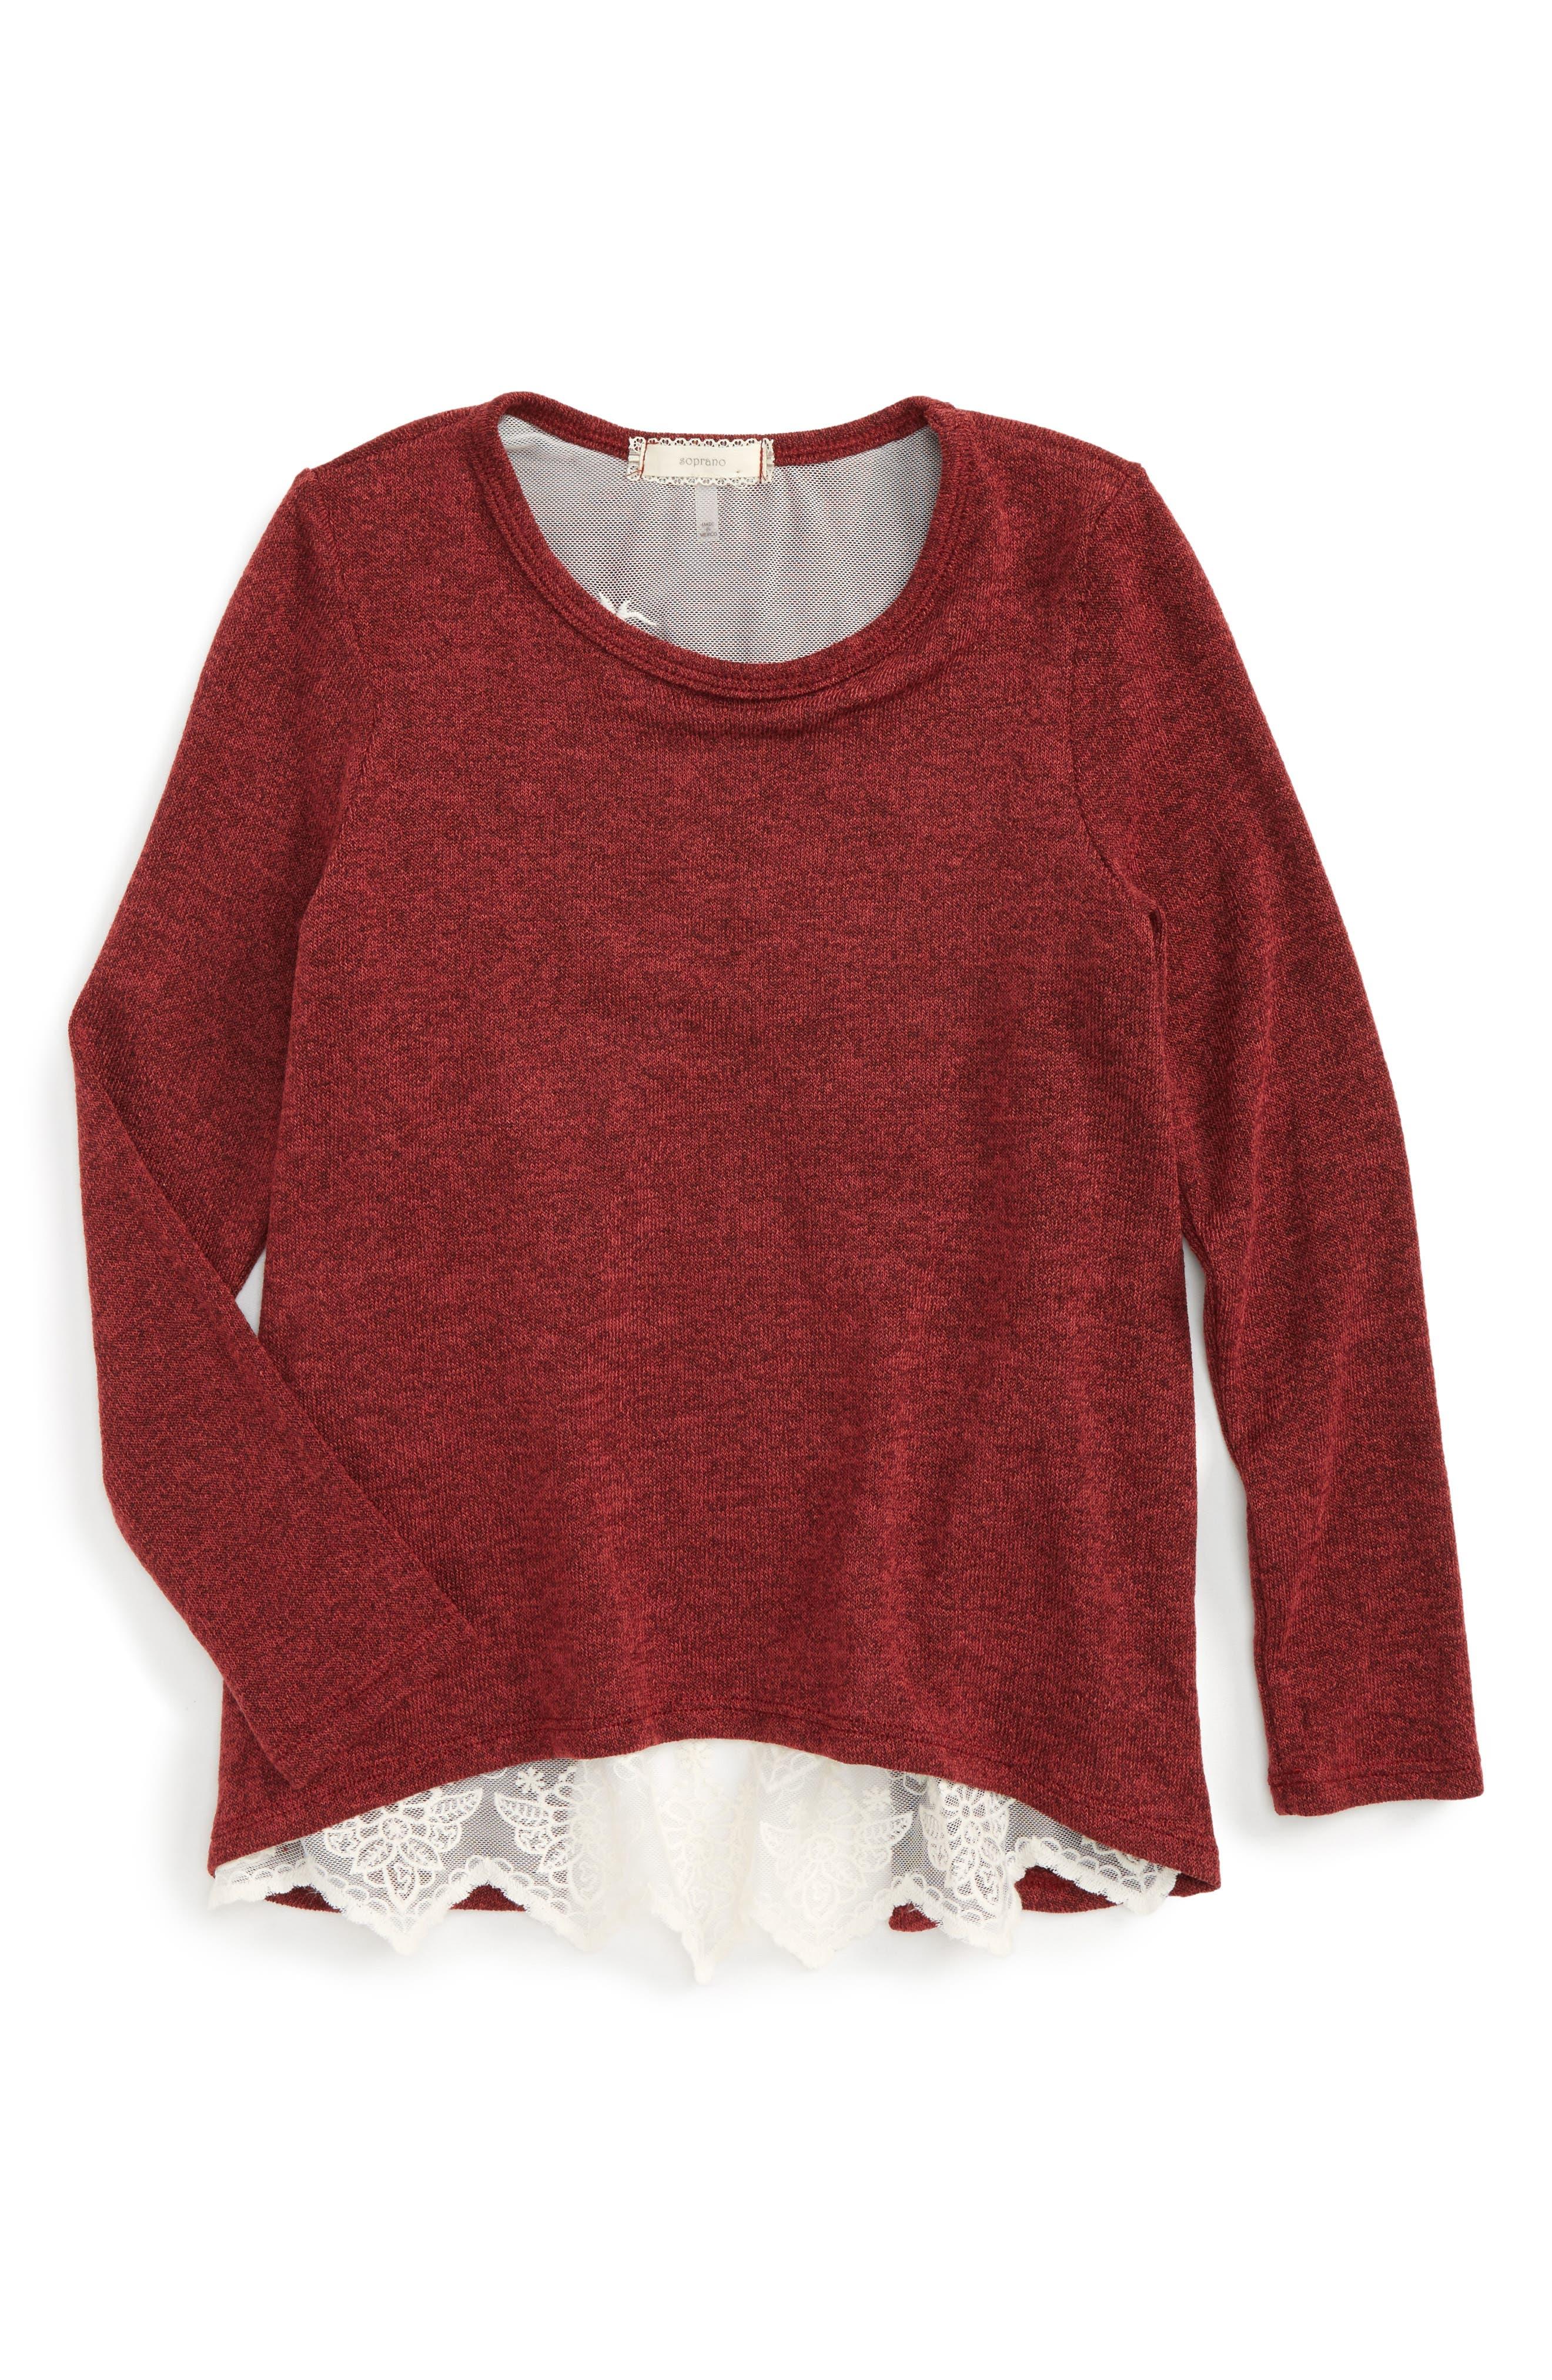 Main Image - Soprano Lace Back Sweater (Big Girls)